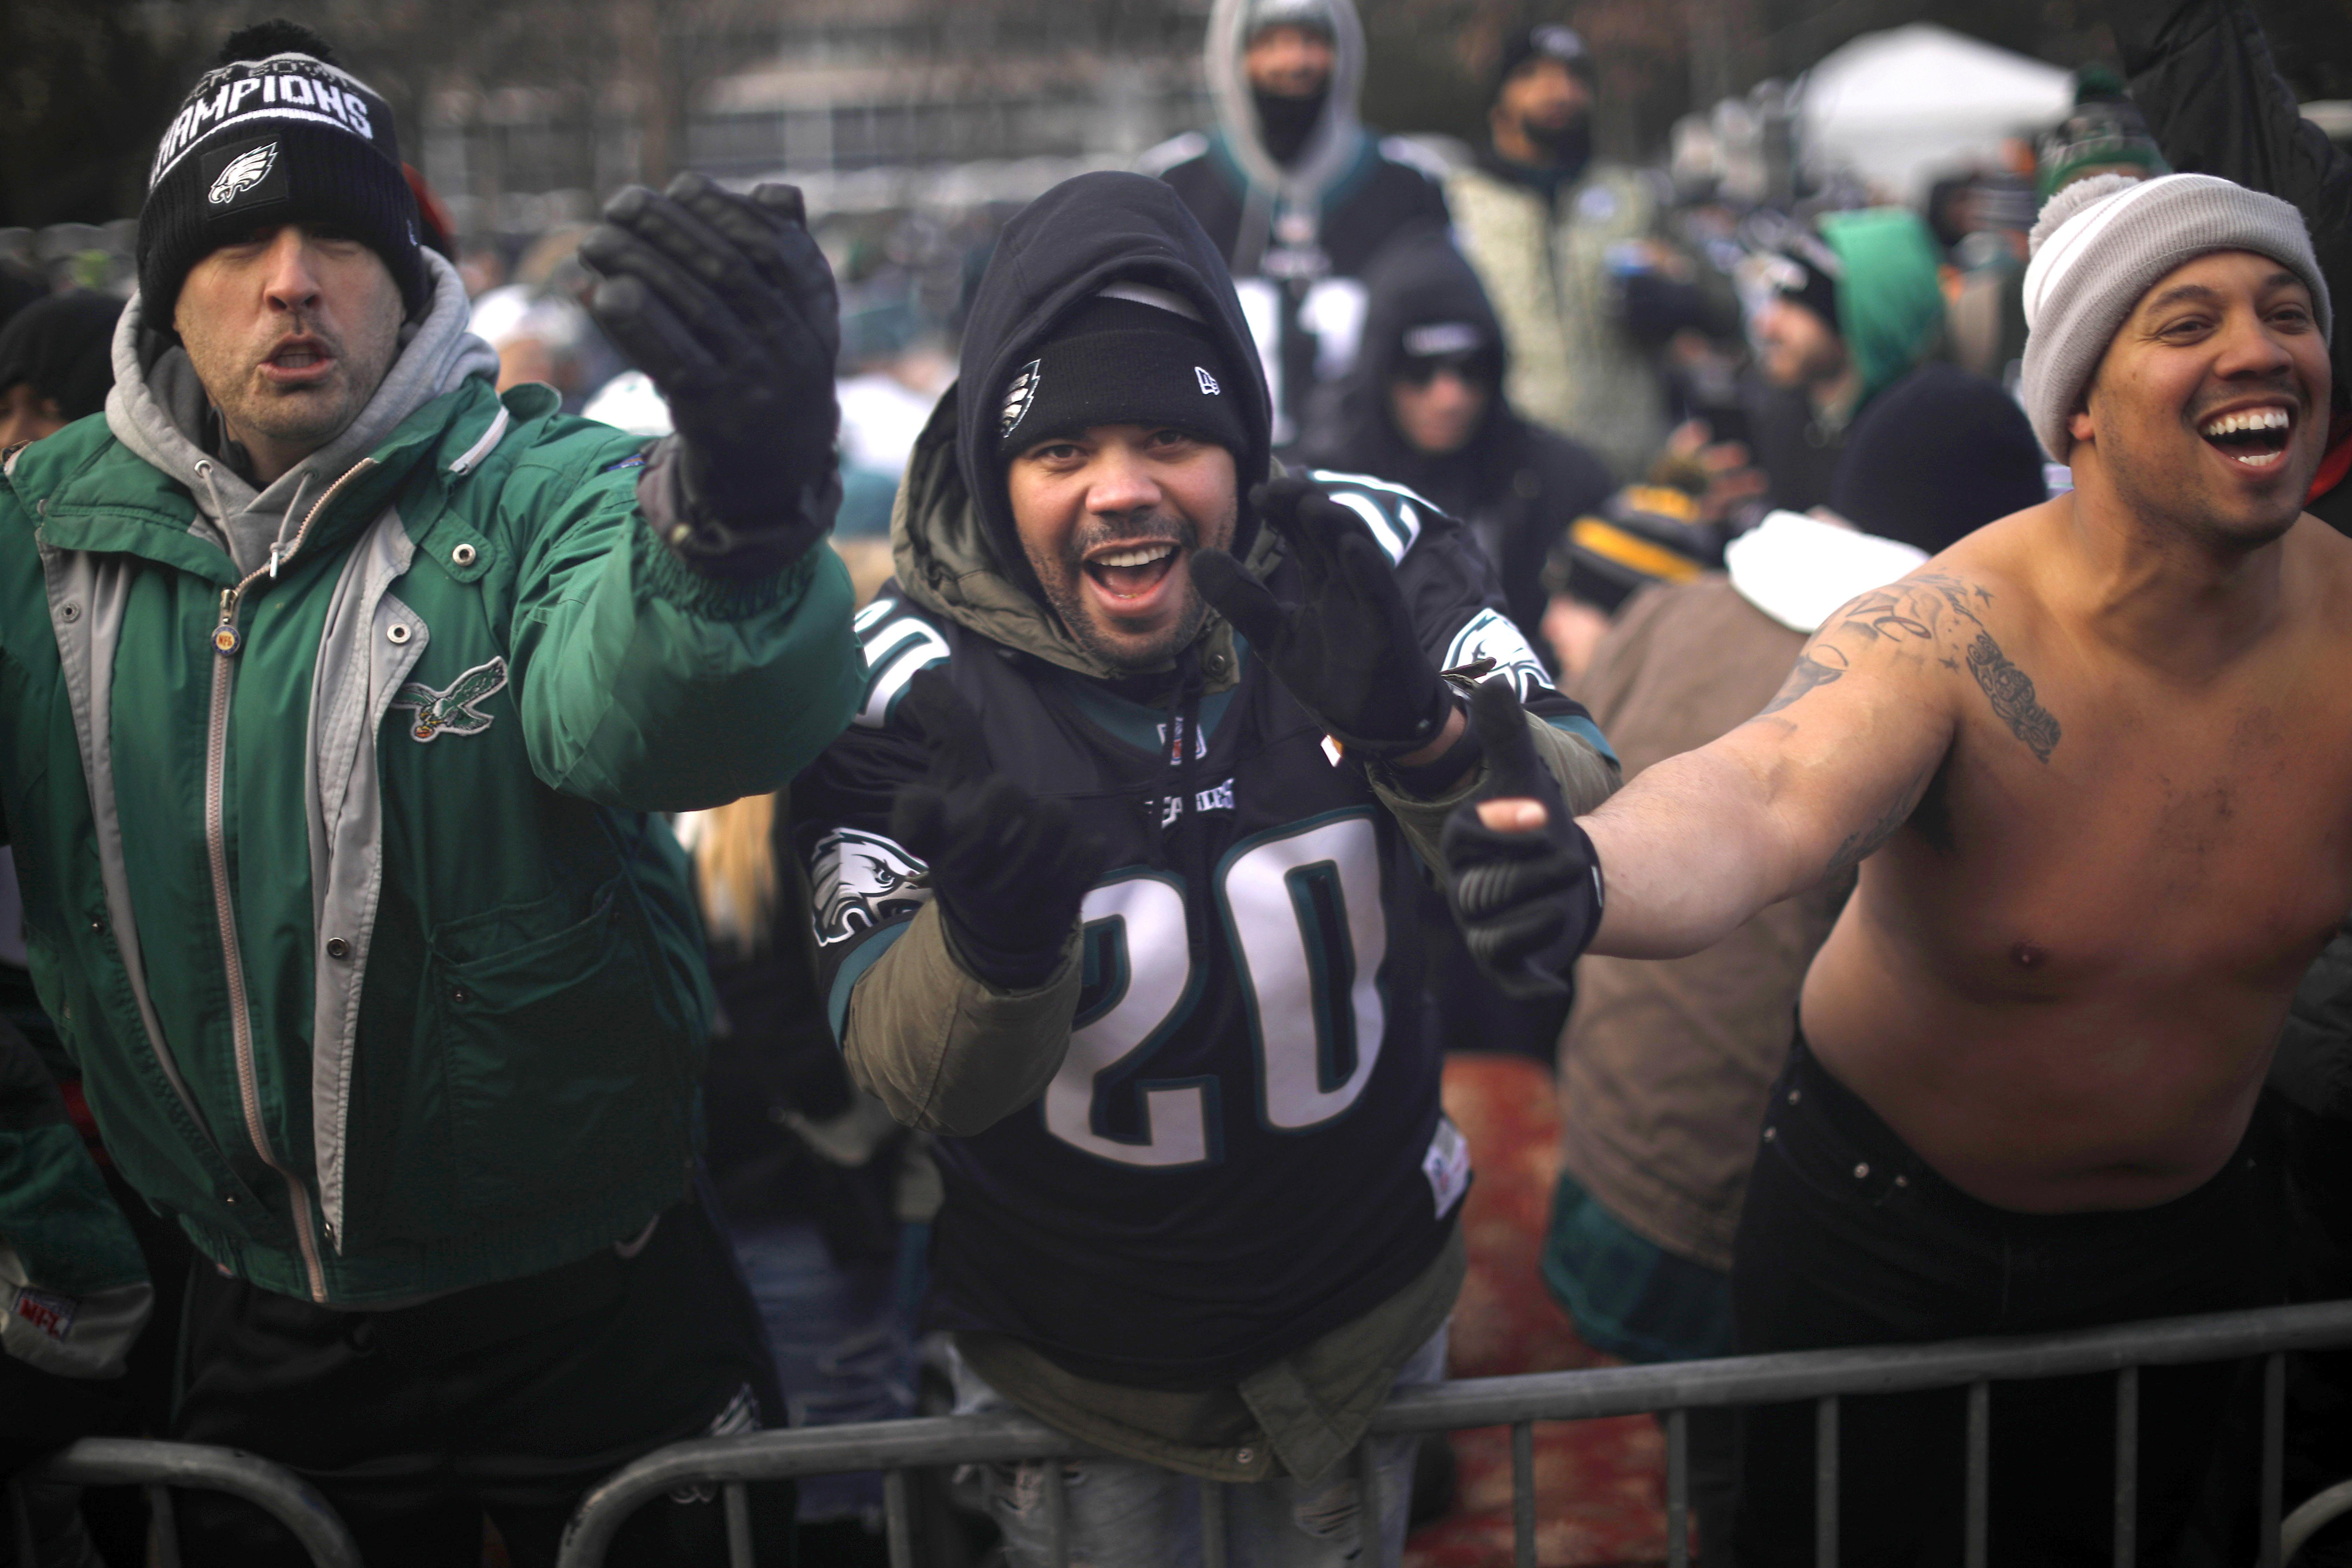 Super Bowl 2018 parade celebrates Philadelphia Eagles  big win - CBS ... f71889f29